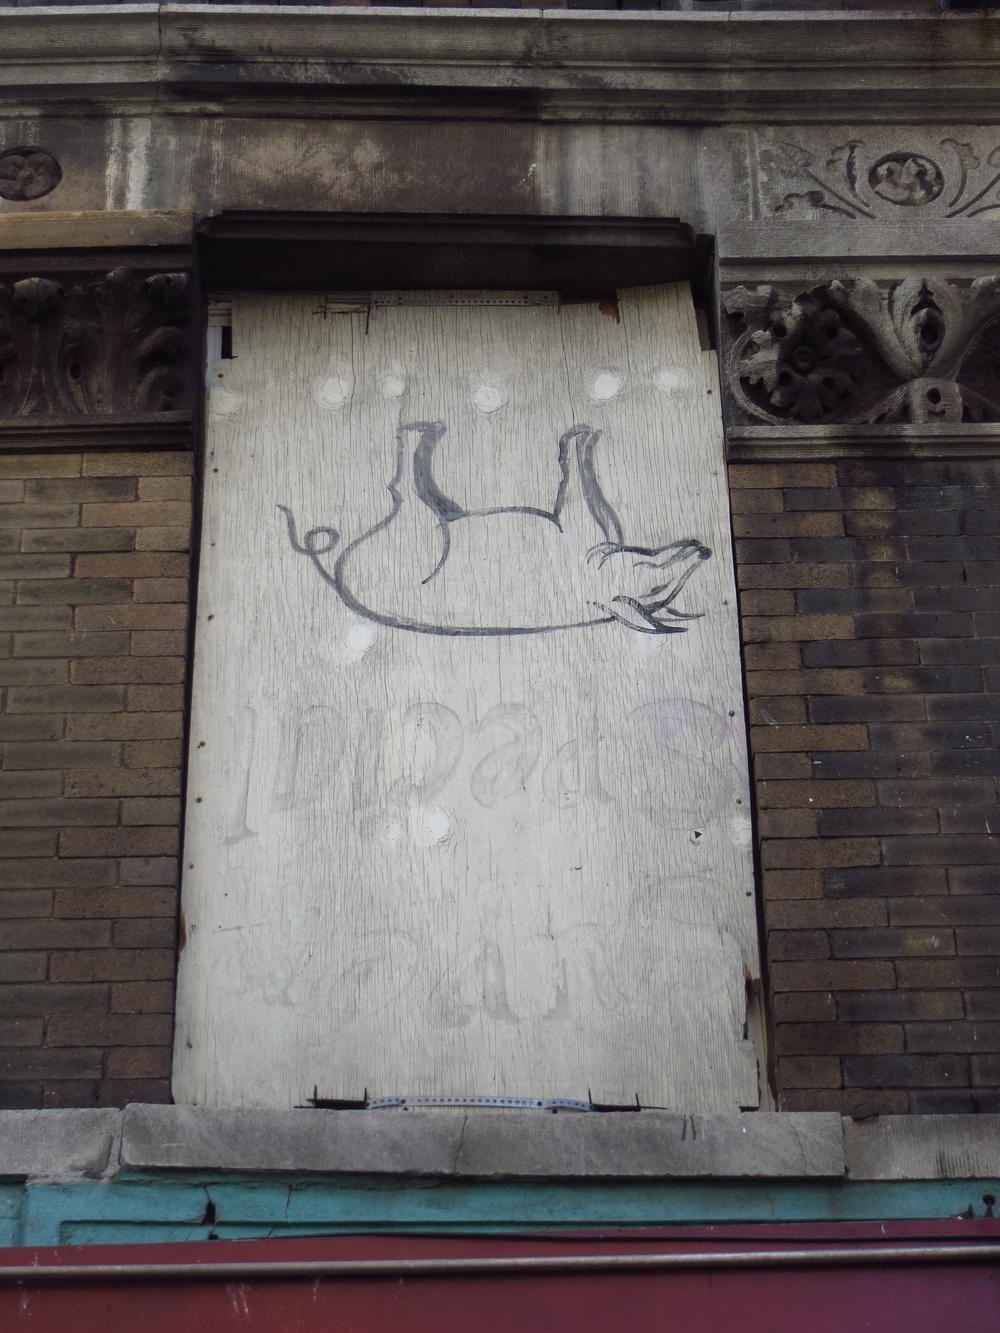 Upside-down pig